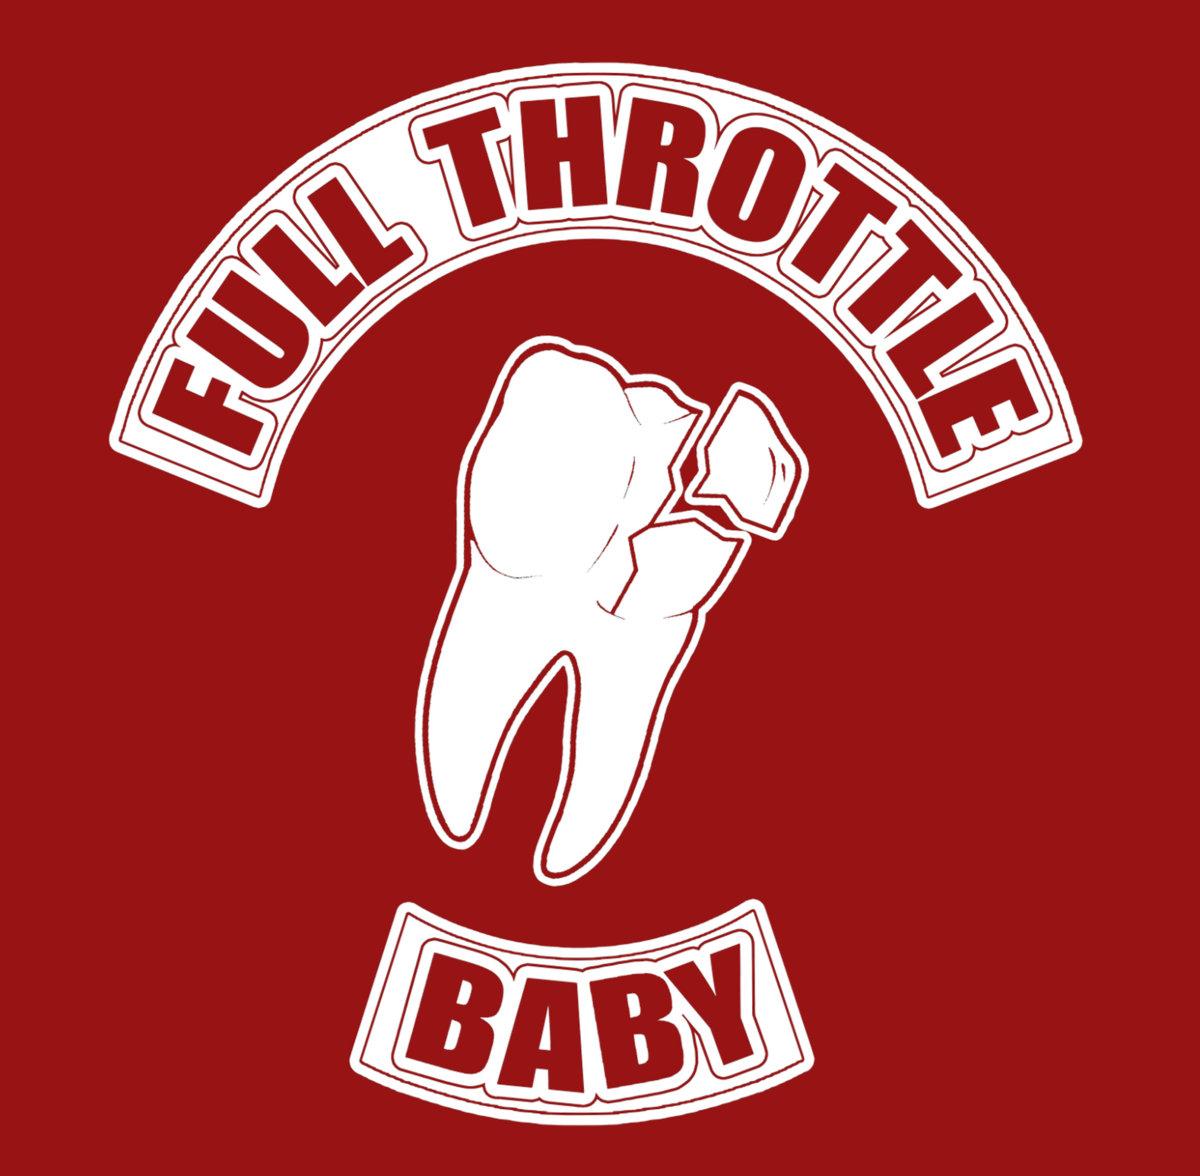 FULL THROTTLE BABY (II)